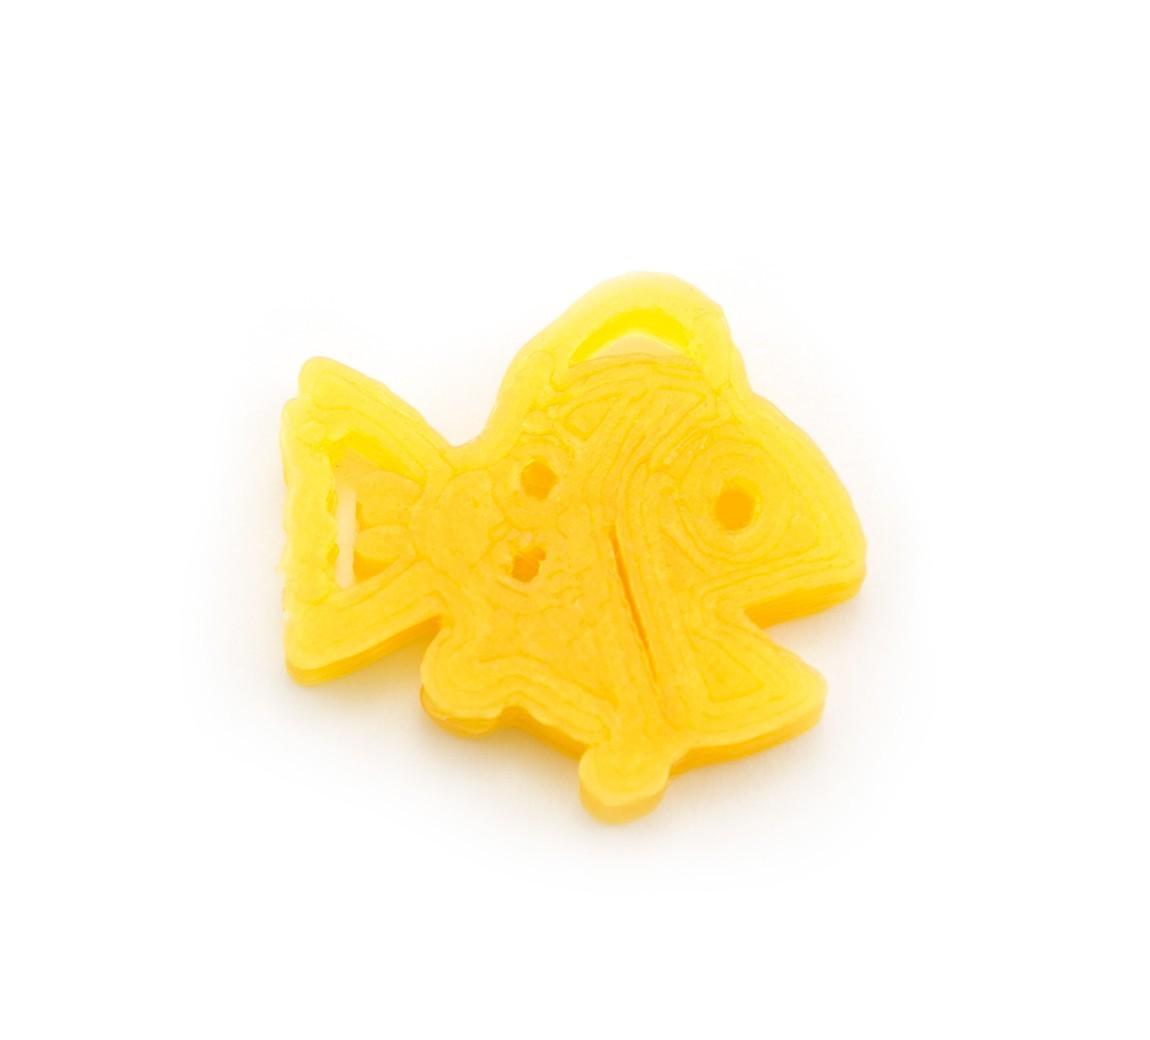 86766bb0b47cf81559f9086edef56c22_1453238470715_01.11.16-product-photography-054.jpg Download free STL file Fish Button • 3D printing model, Lucy_Haribert